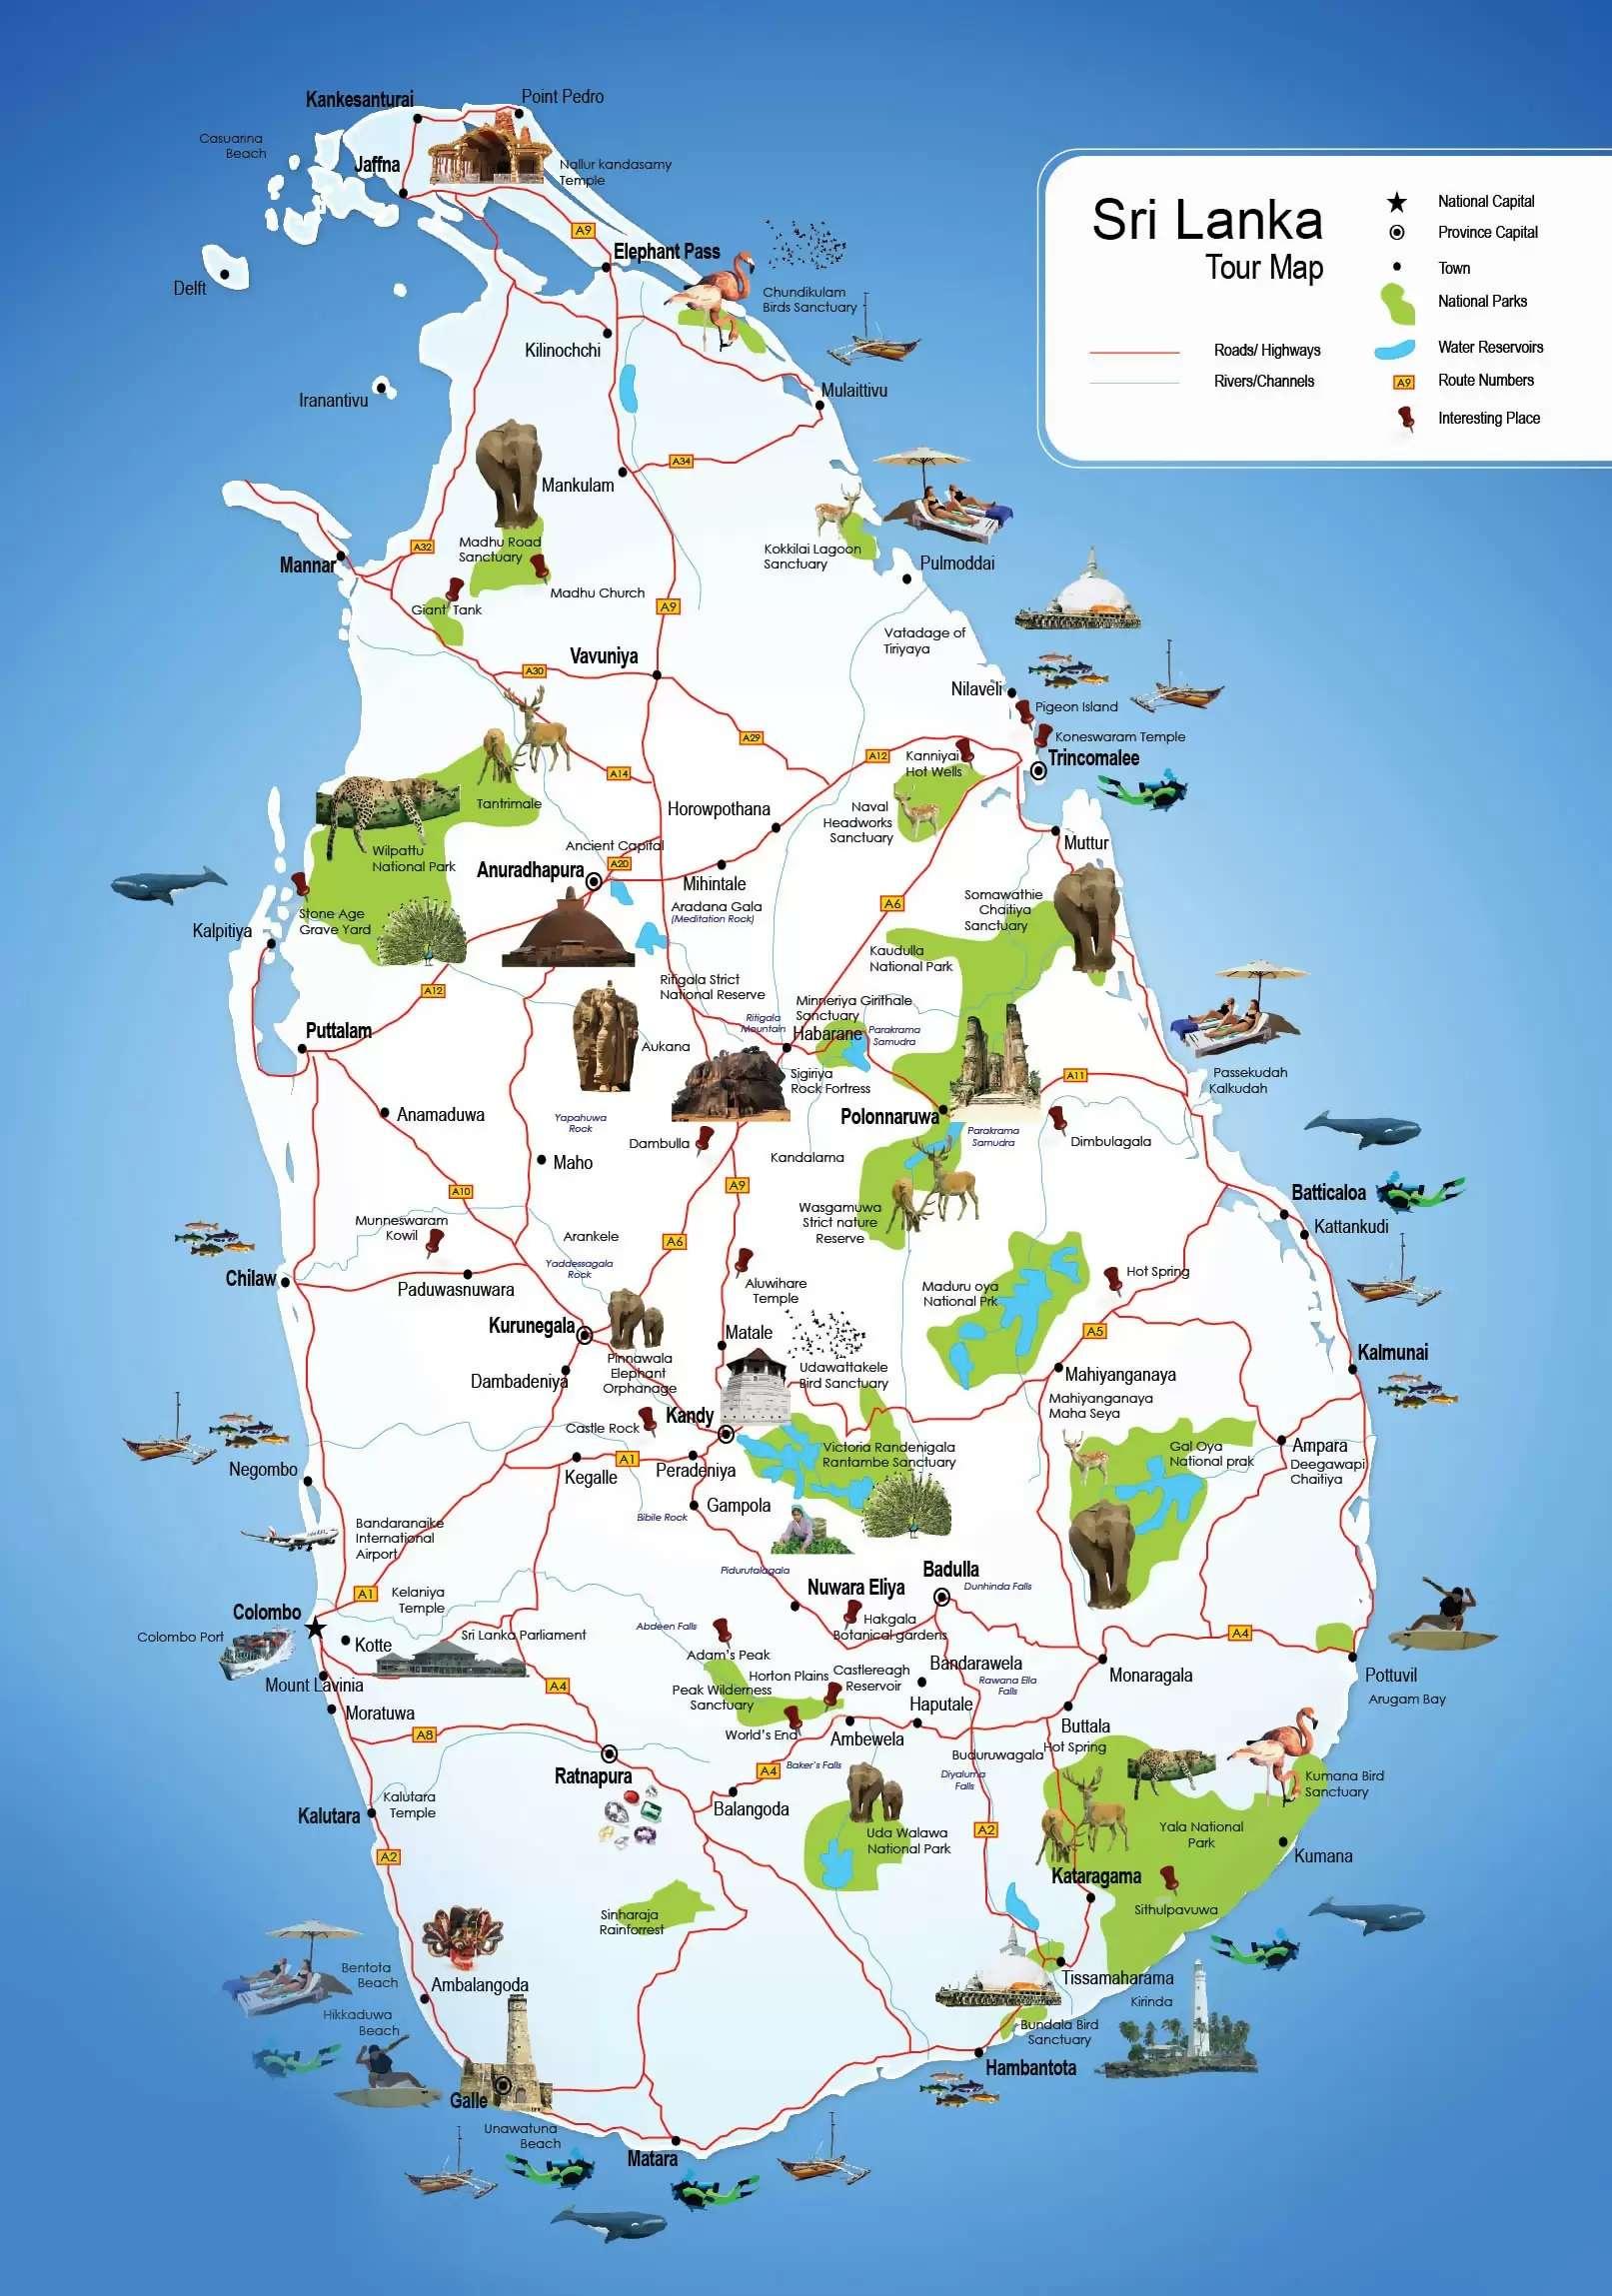 large-detailed-tourist-map-of-sri-lanka